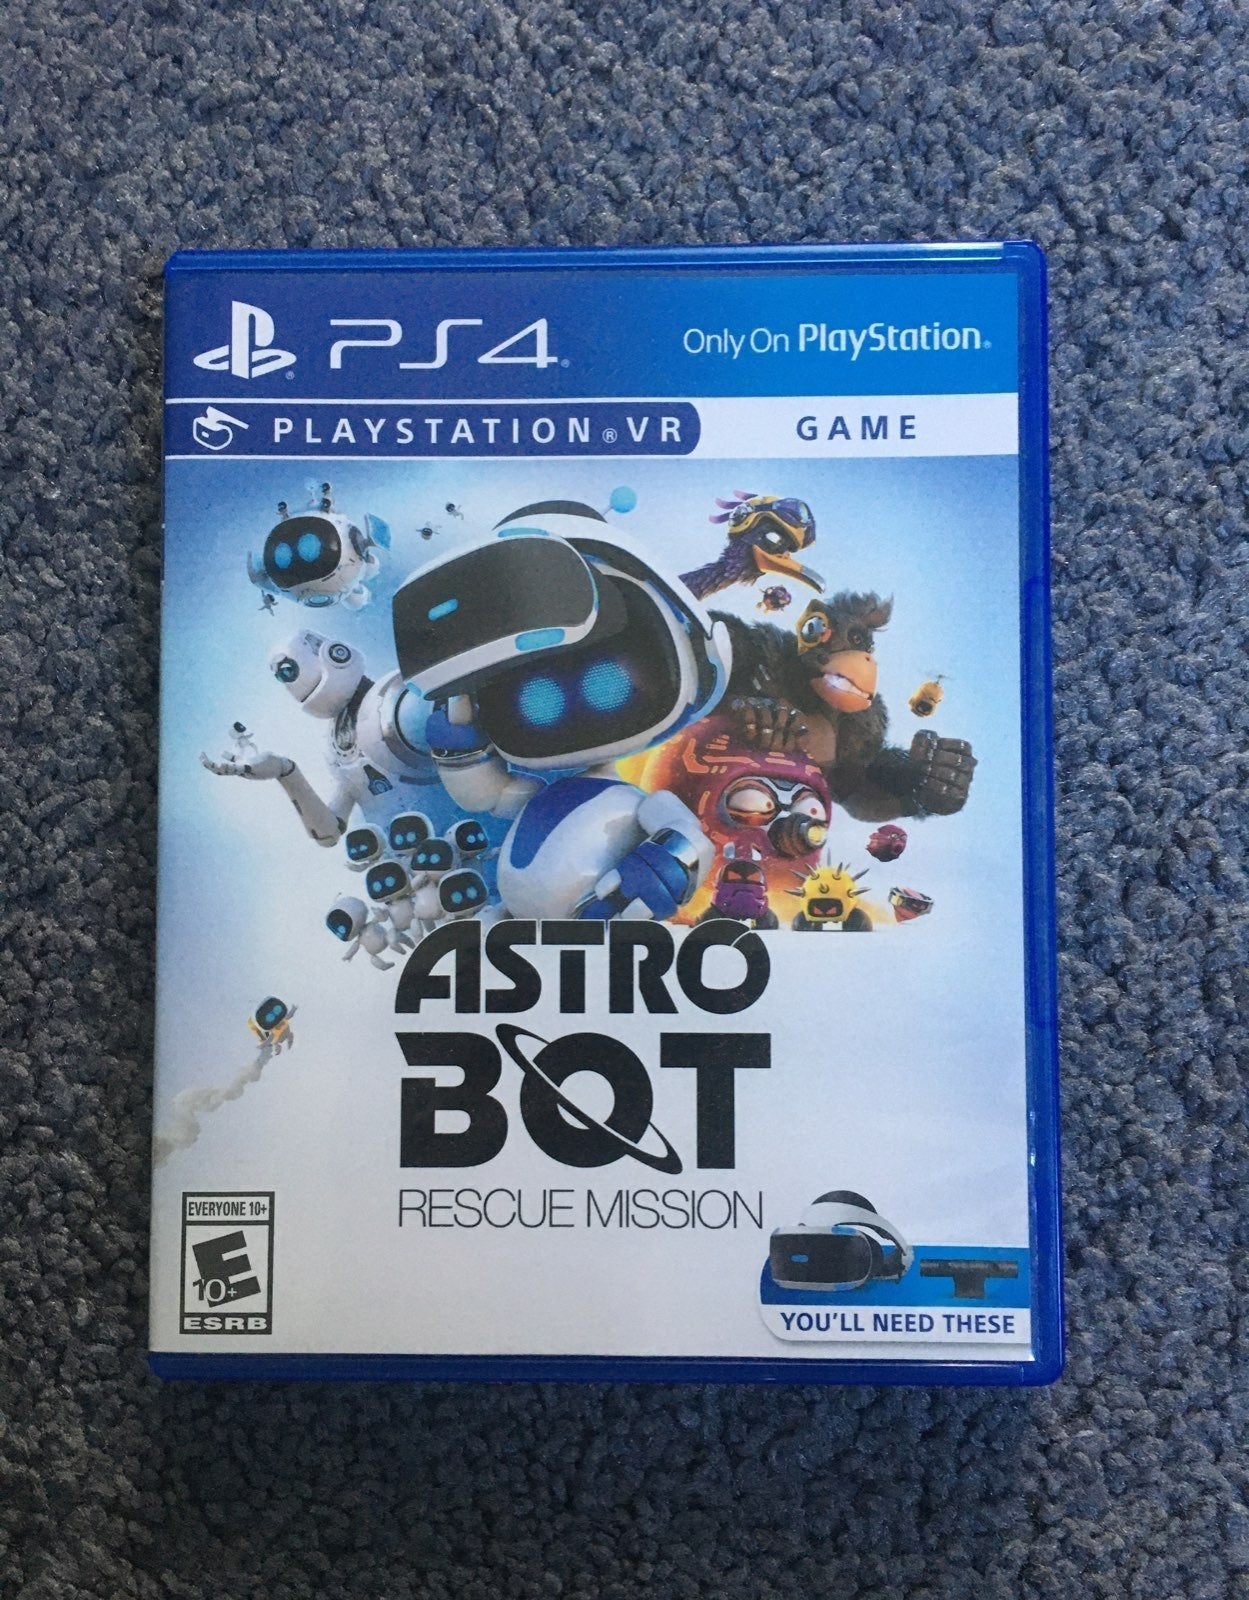 PS4 Astro Bot Rescue Mission